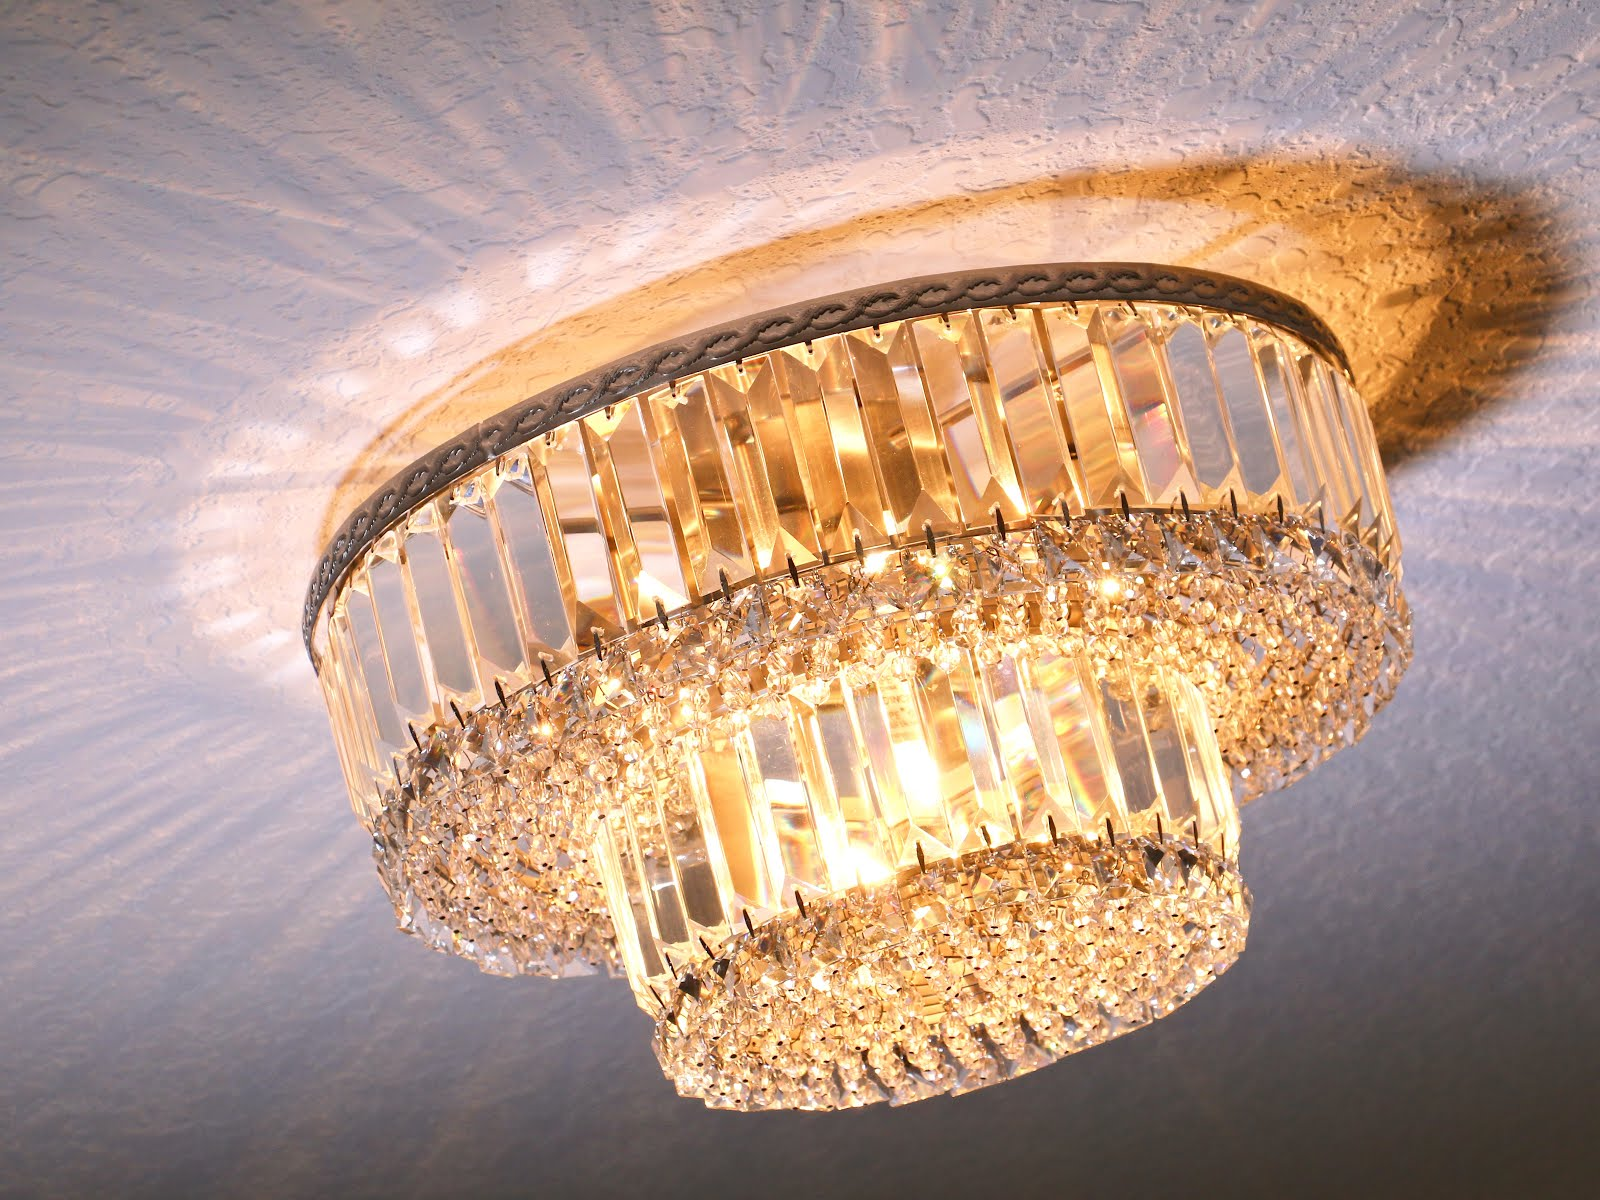 Lamps-Plus-Magnificence-Satin-Nickel-16-Wide-Crystal-Ceiling-Light-Vivi-Brizuela